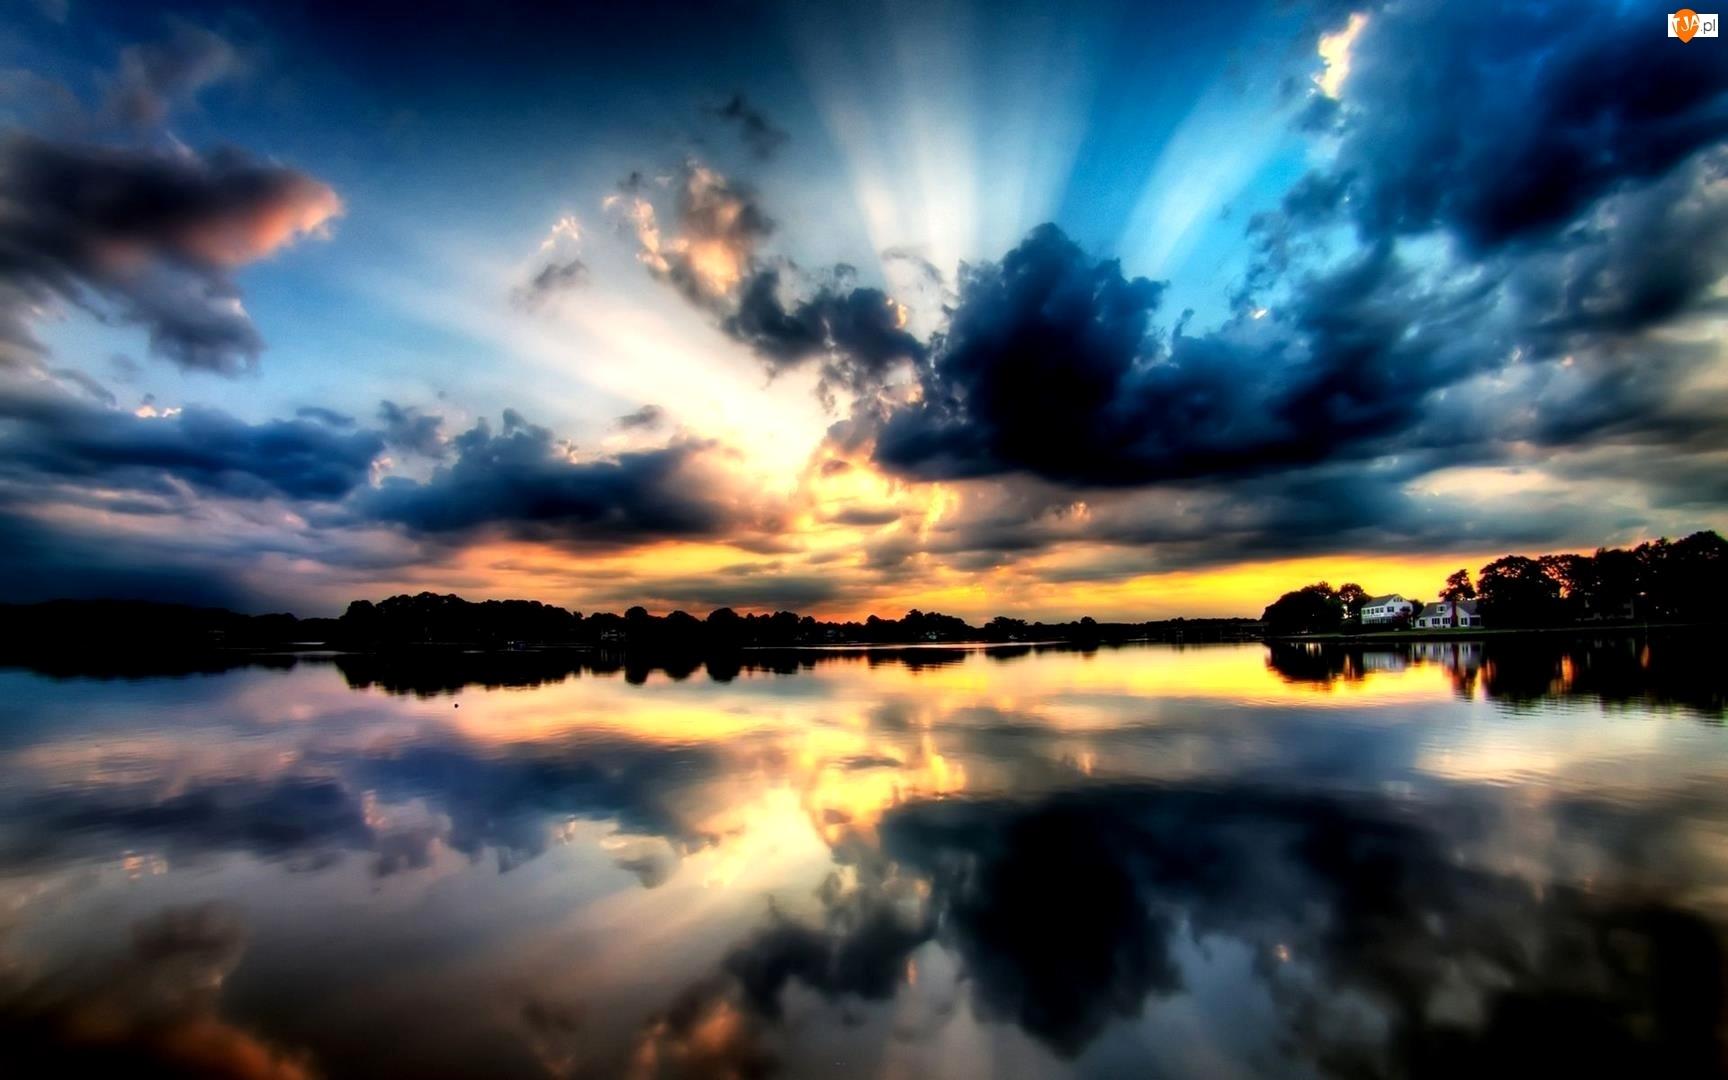 Słońca, Jezioro, Odbicie, Chmury, Zachód